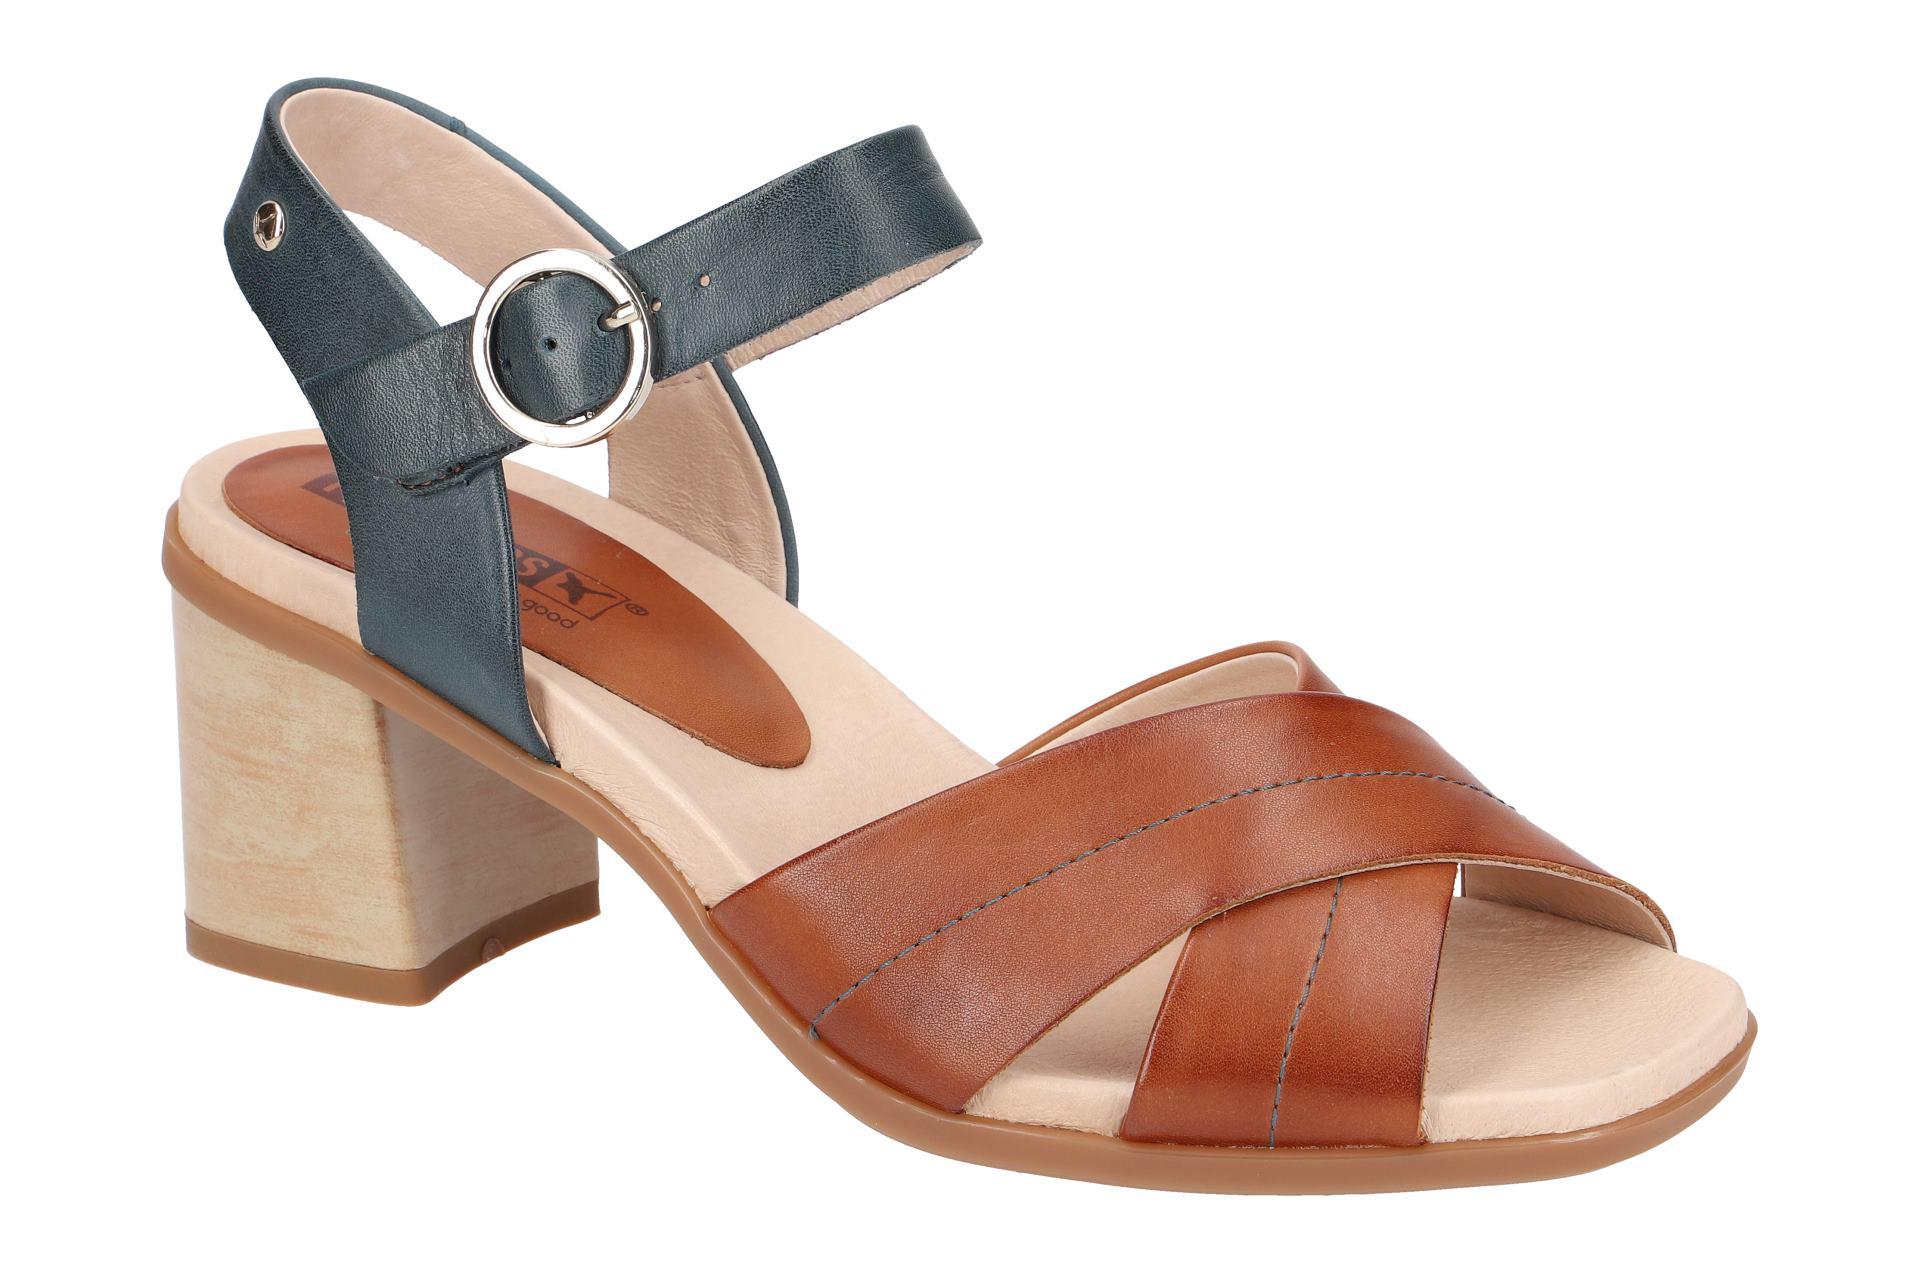 Pikolinos DENIA Damen Sandalette - Riemchen Sandalen braun NEU